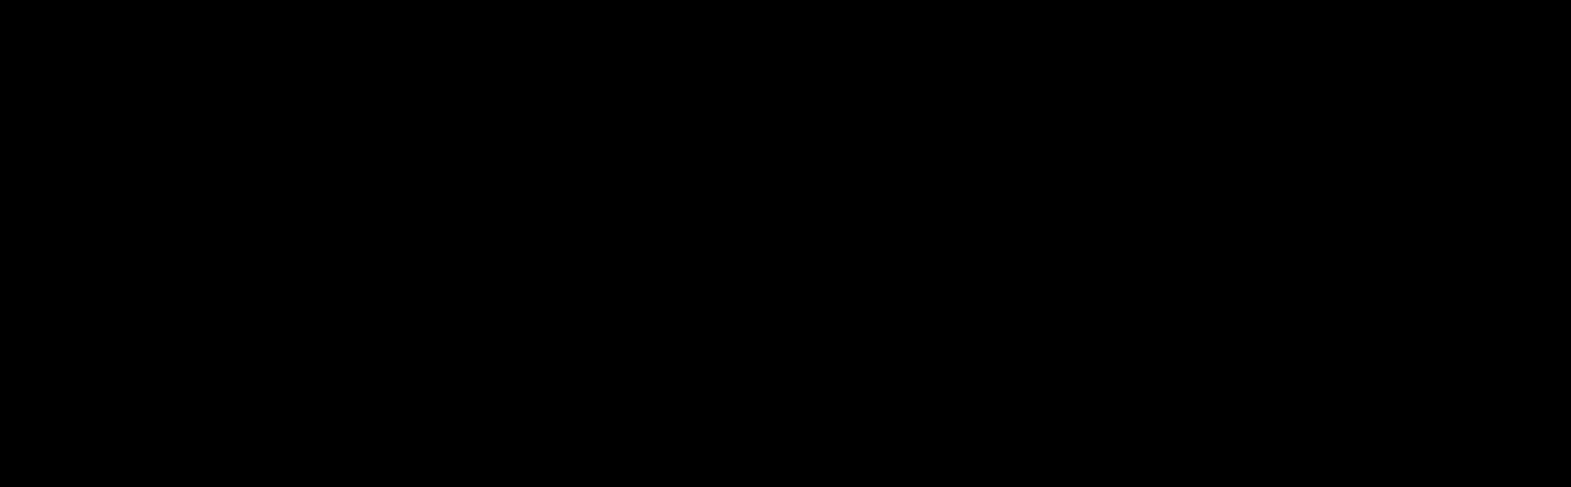 2,3-DCPE Hydrochloric Acid Salt